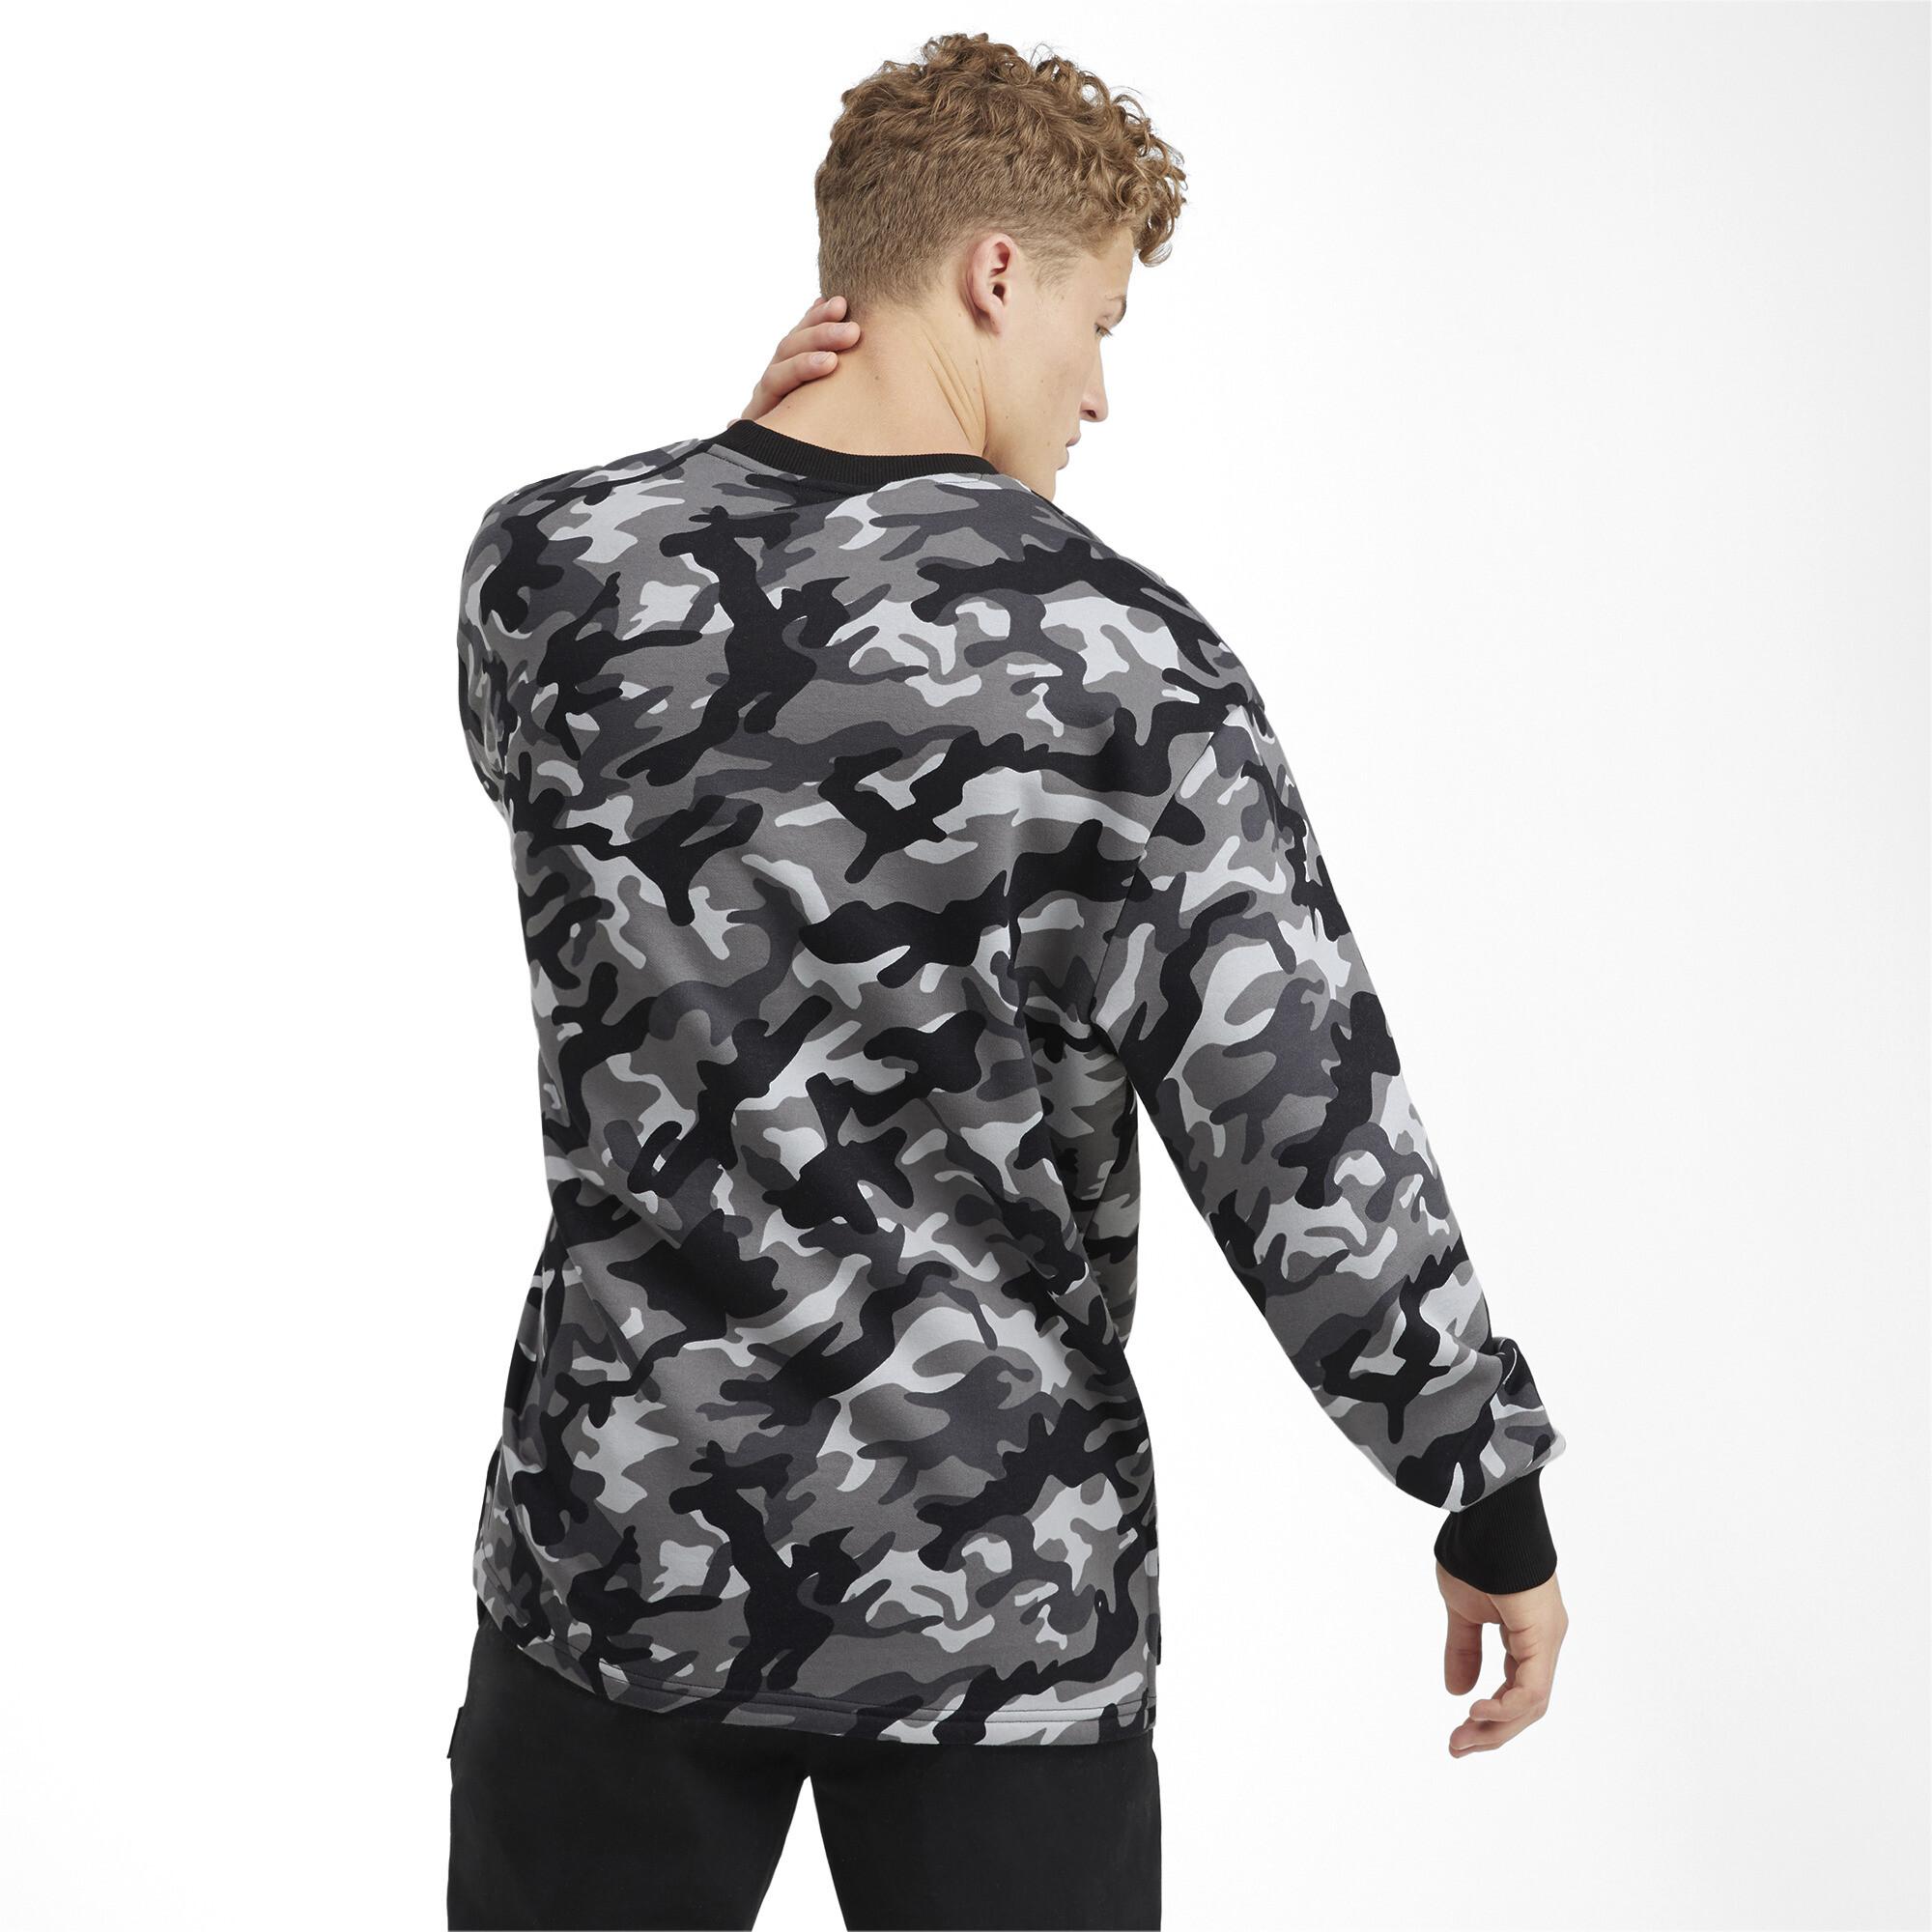 PUMA-Rebel-Camo-Men-039-s-Fleece-Crewneck-Sweatshirt-Men-Sweat-Basics thumbnail 5